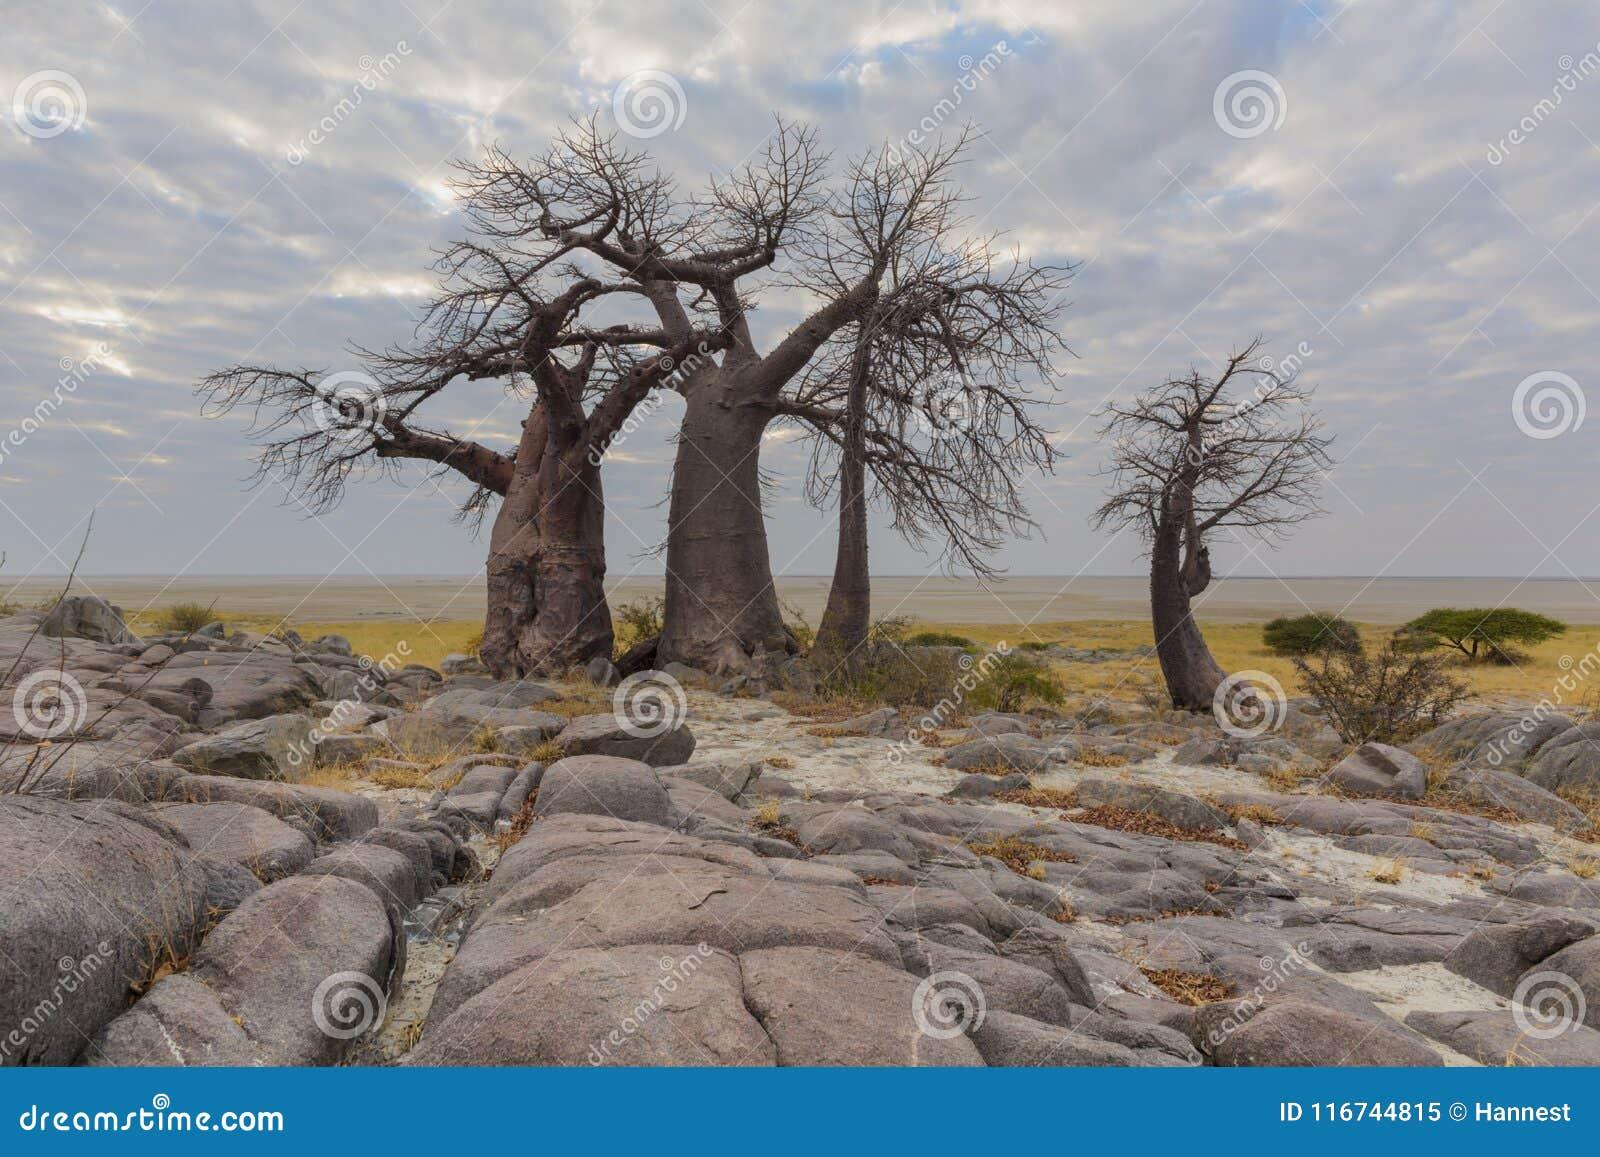 Rocks and baobab trees